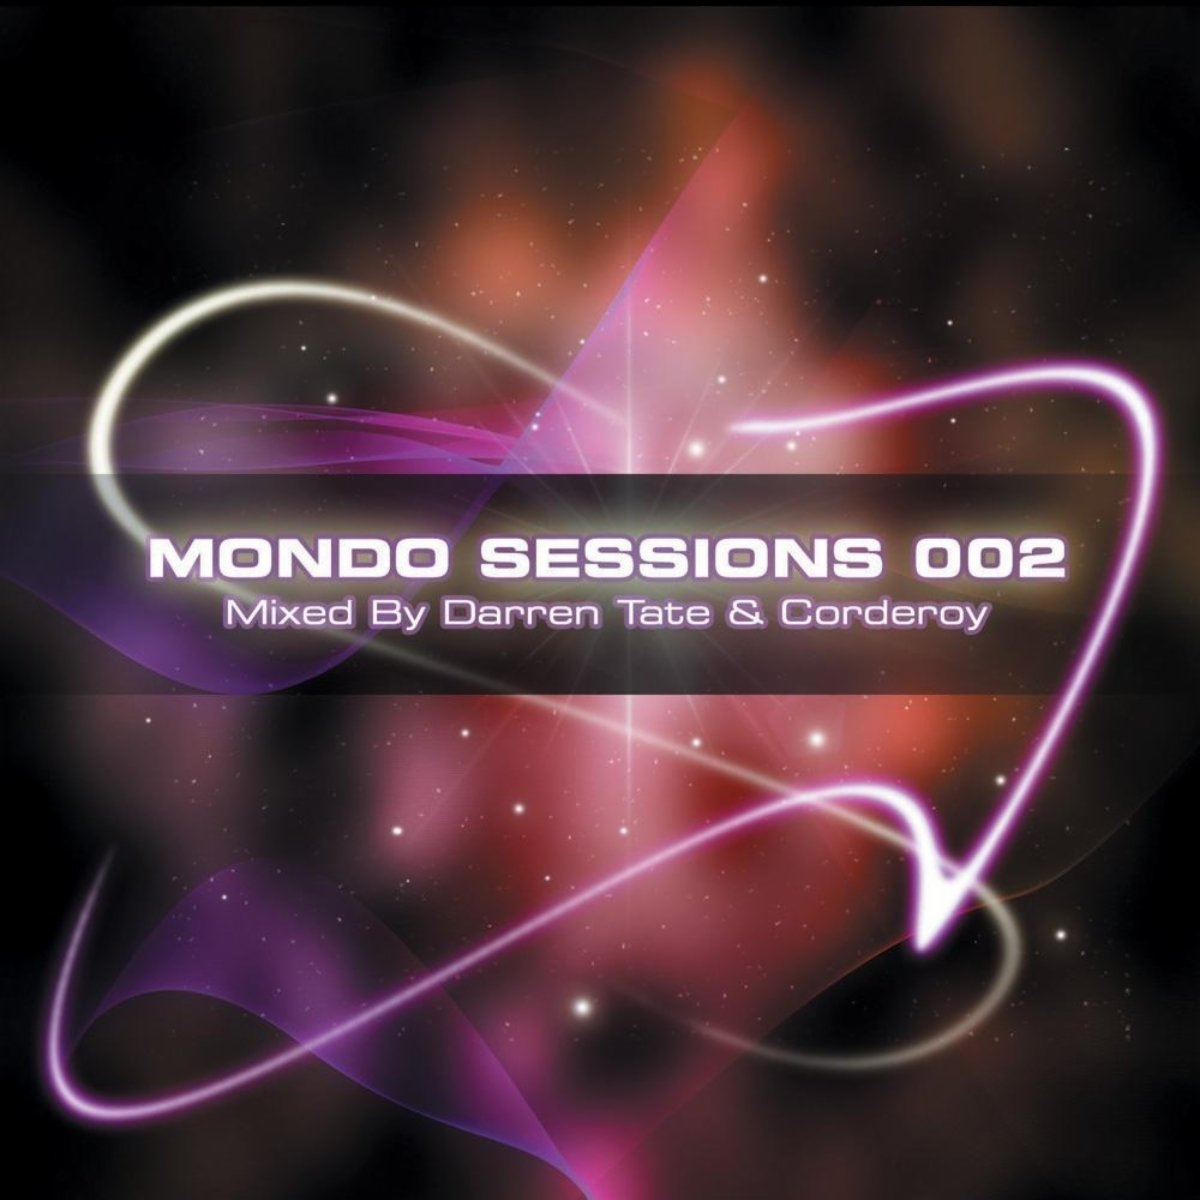 VA – Mondo Sessions 002  Mixed by Darren Tate & Corderoy (2009) [FLAC]